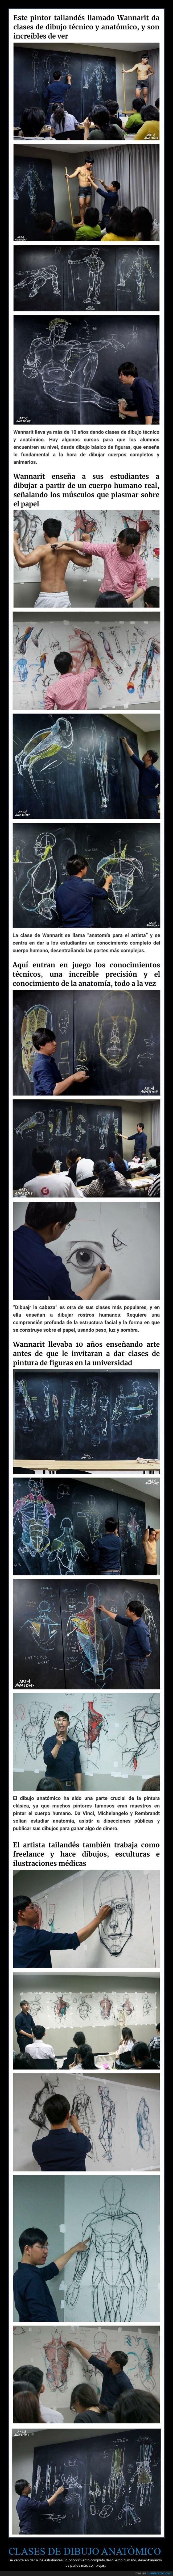 anatomía,clase,dibujo,profesor